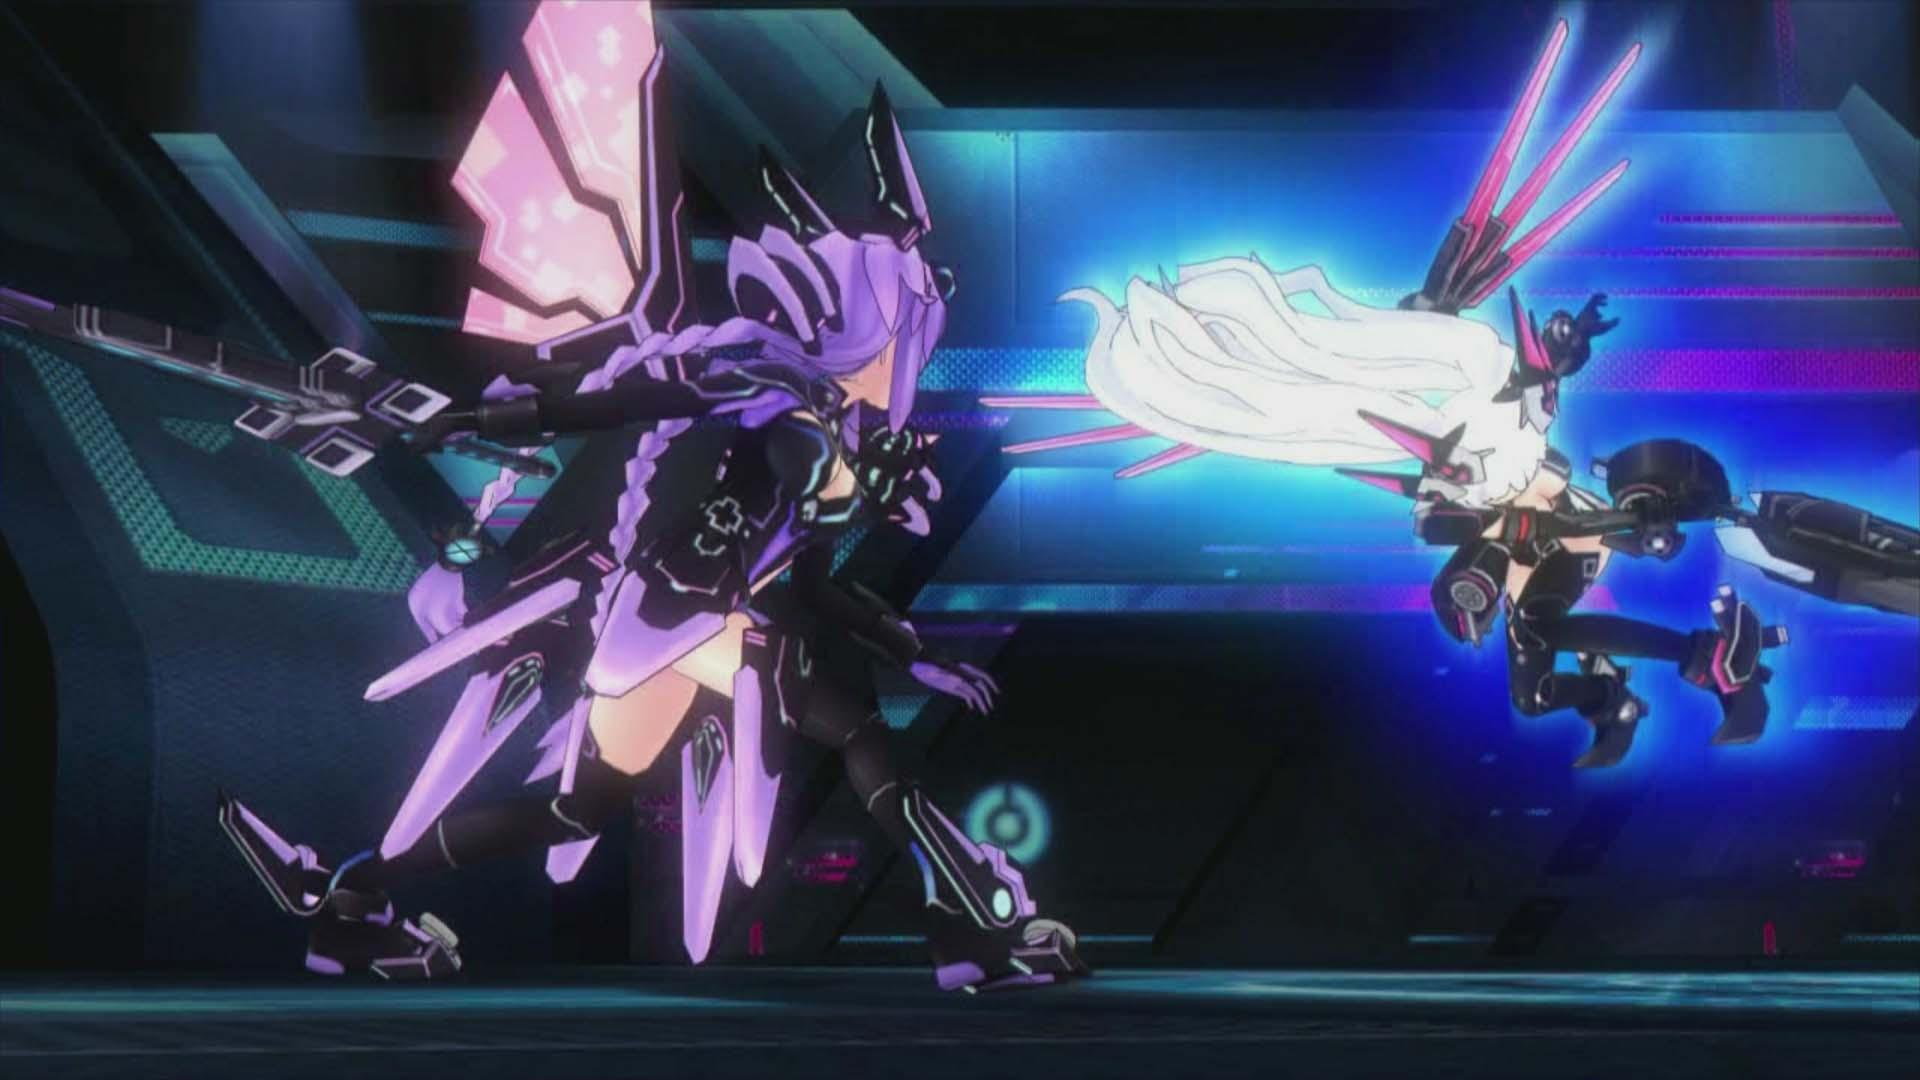 Transformers Fall Of Cybertron Wallpaper Hd Sggaminginfo 187 Hyperdimension Neptunia Victory Review